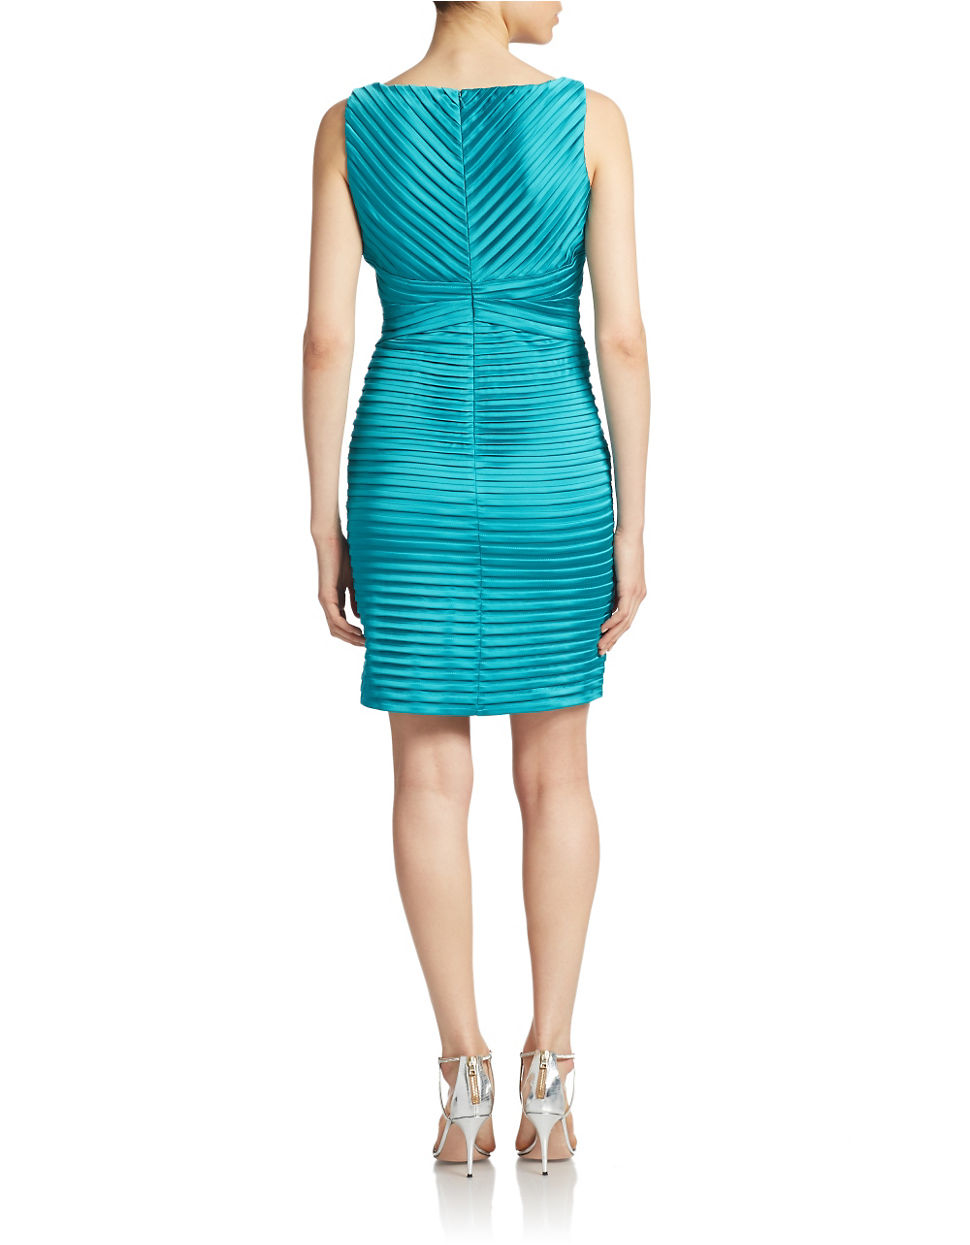 Calvin Klein Satin Teal Stretch Sheath Dress In Blue Lyst